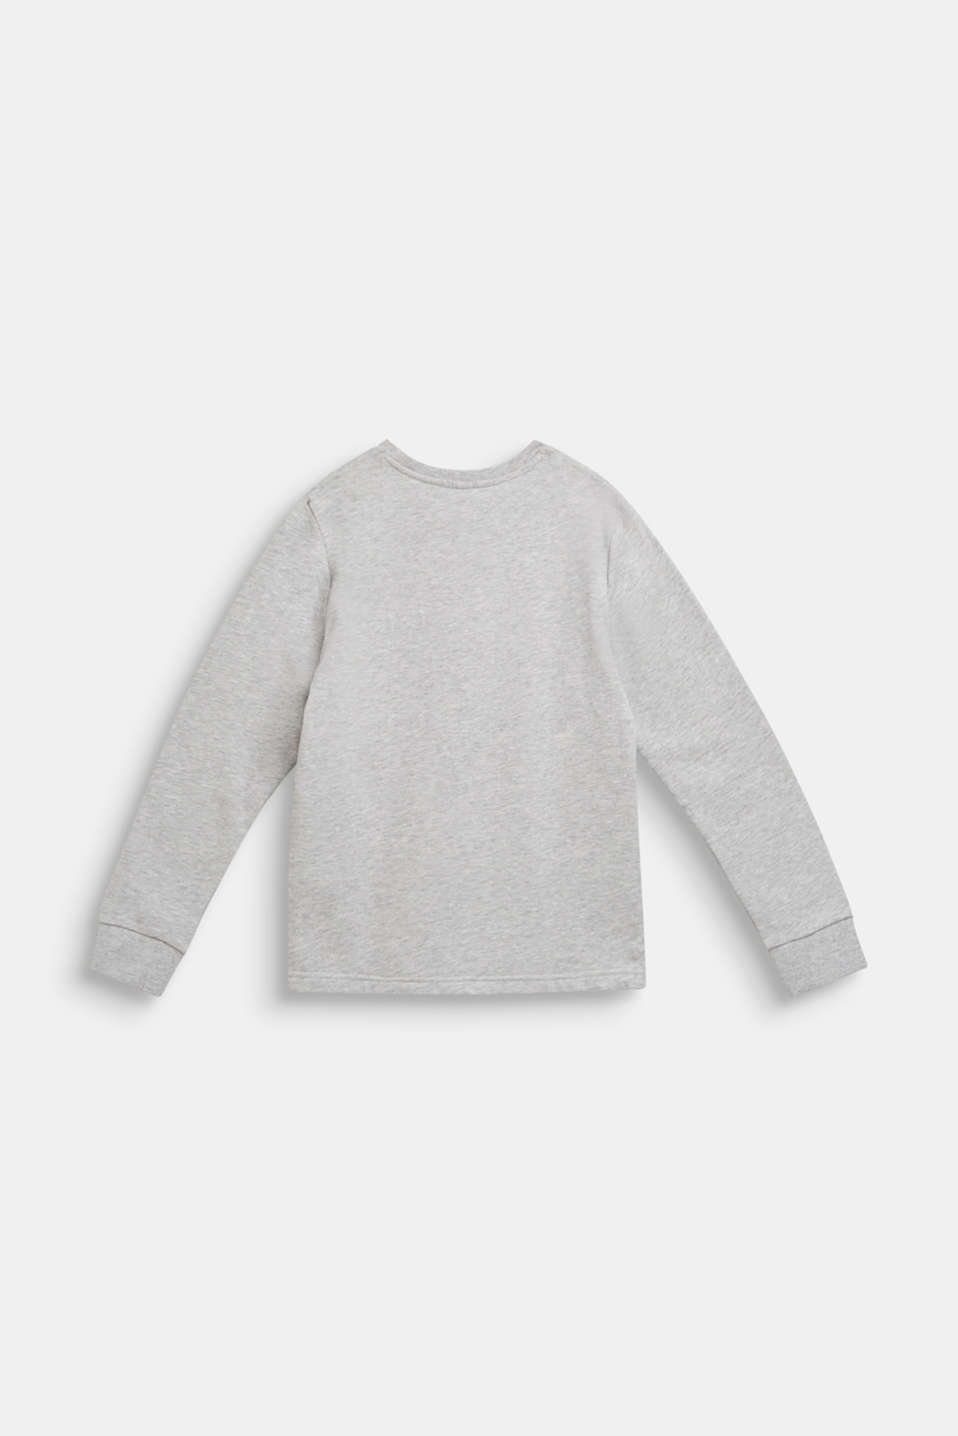 Statement print sweatshirt, LCHEATHER SILVER, detail image number 1